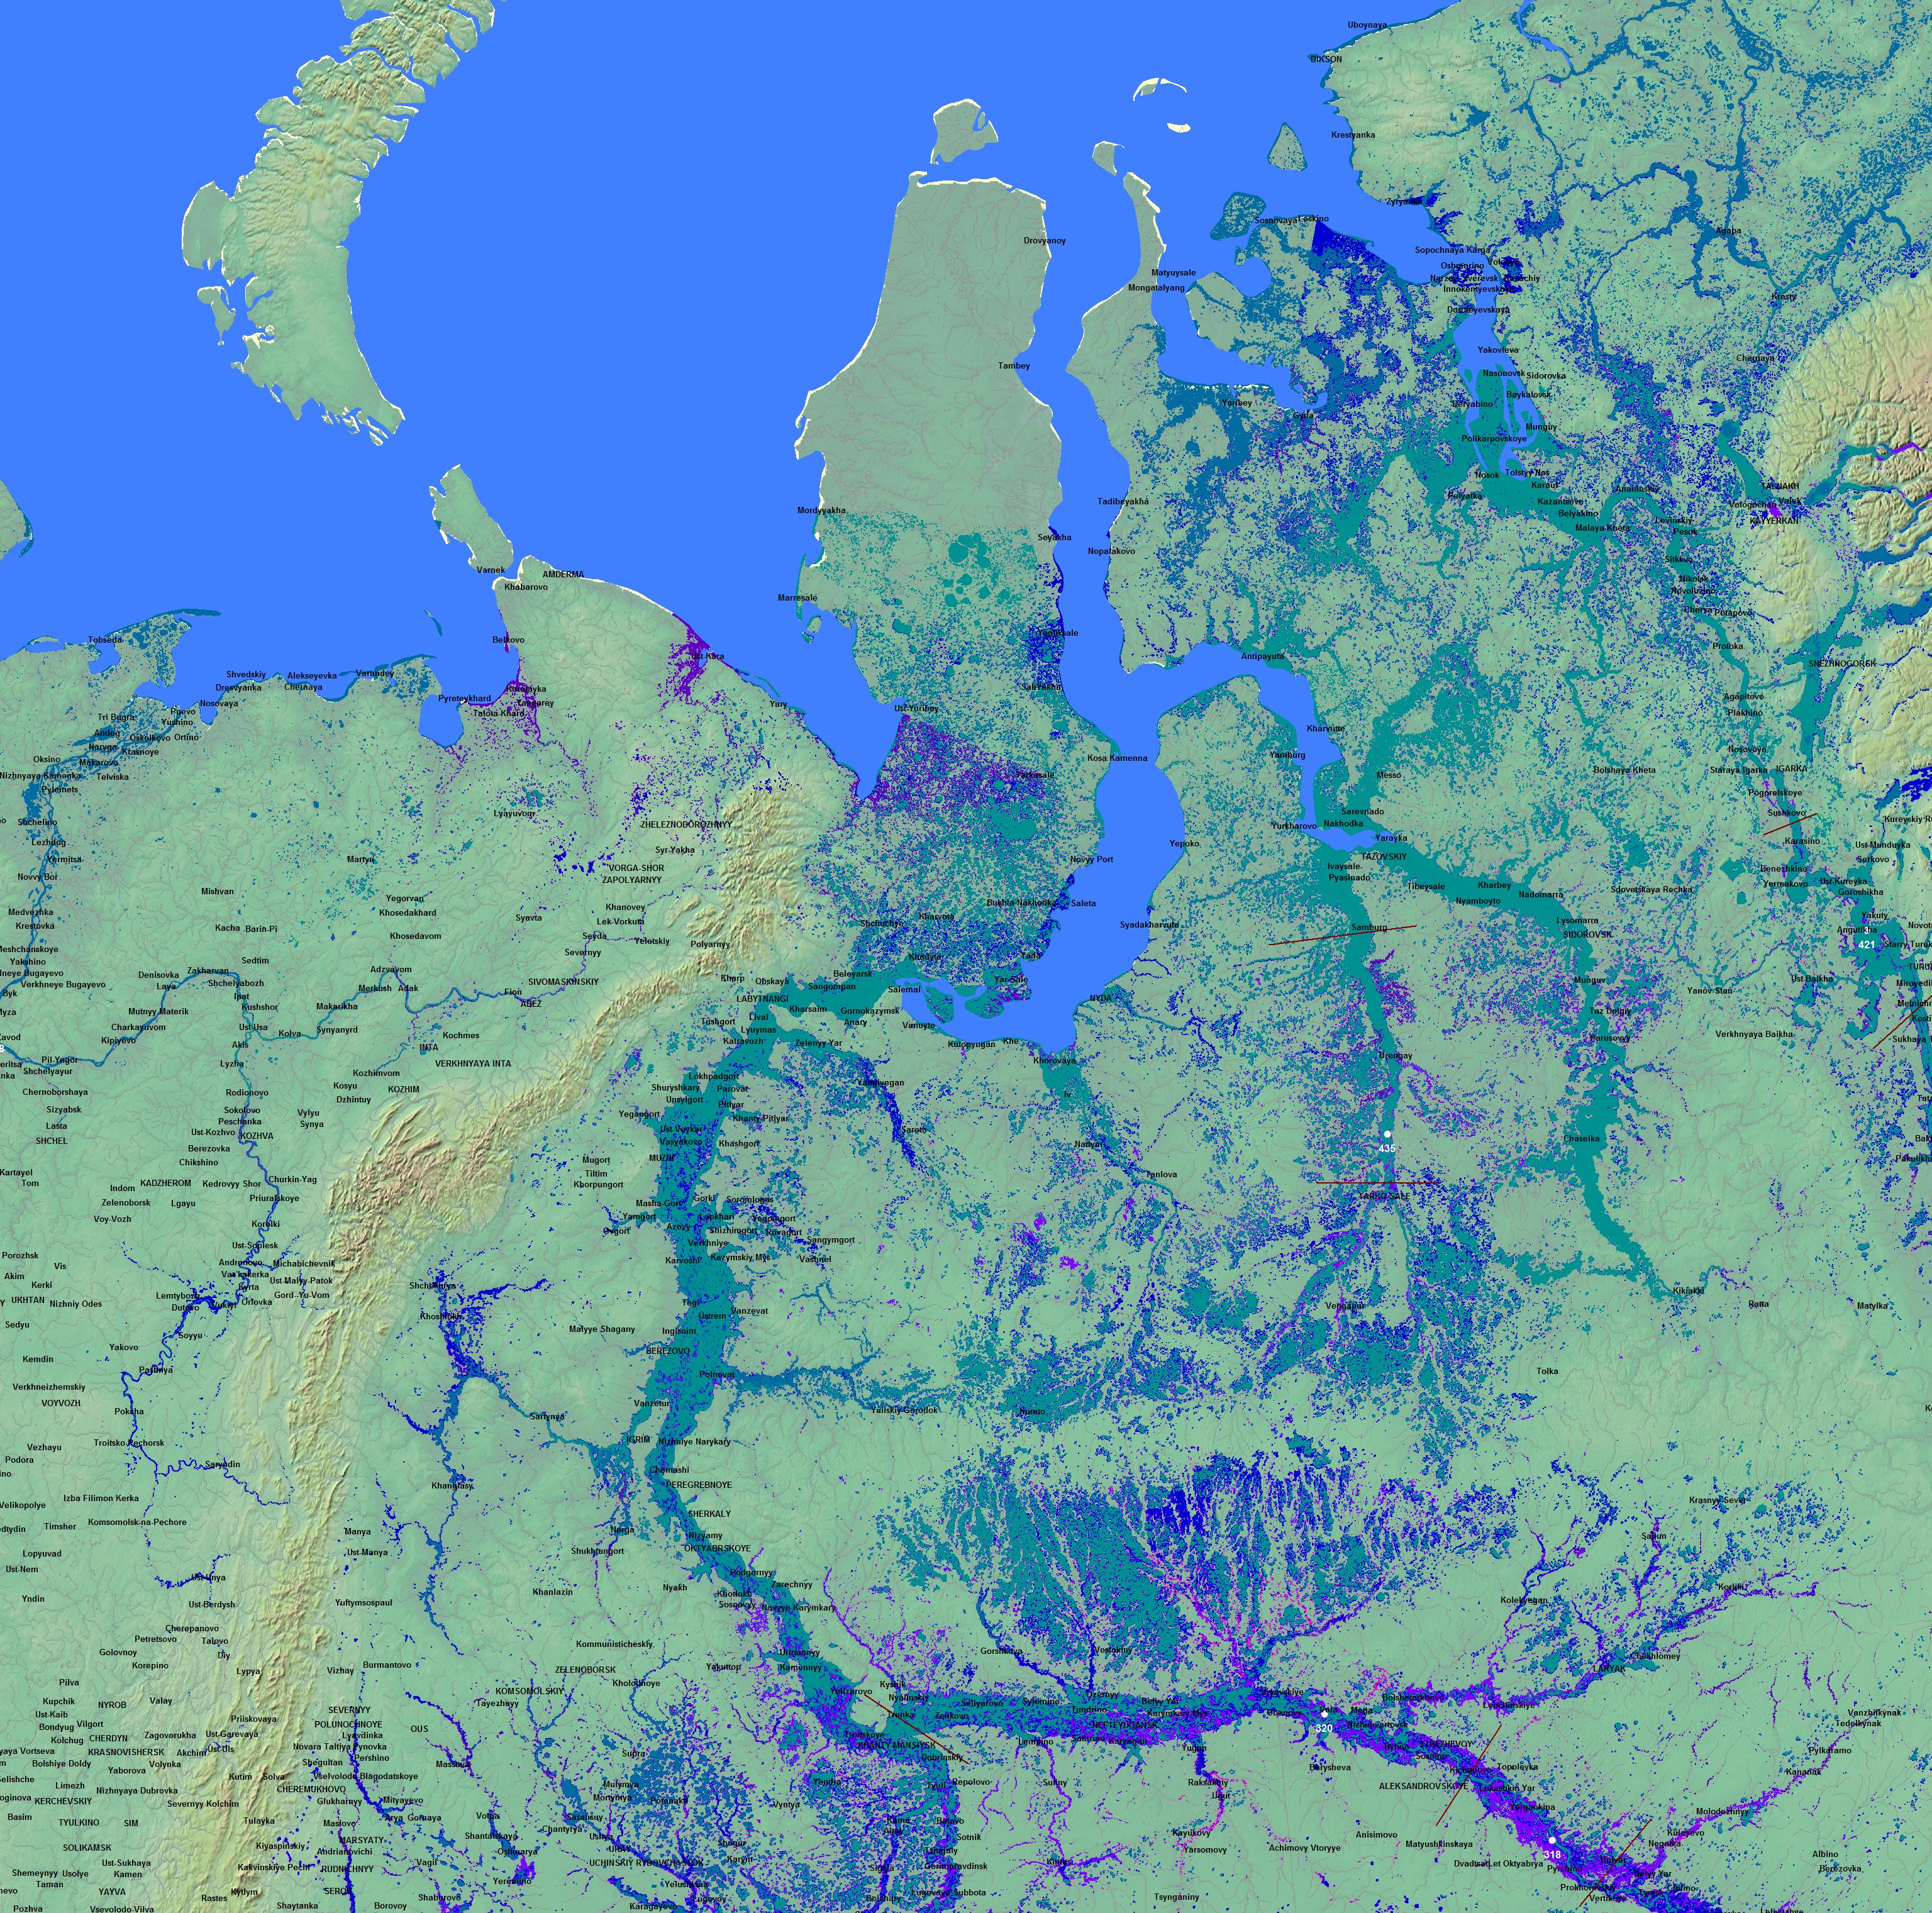 Global Atlas Of Floodplains EN - Colorado river map world atlas